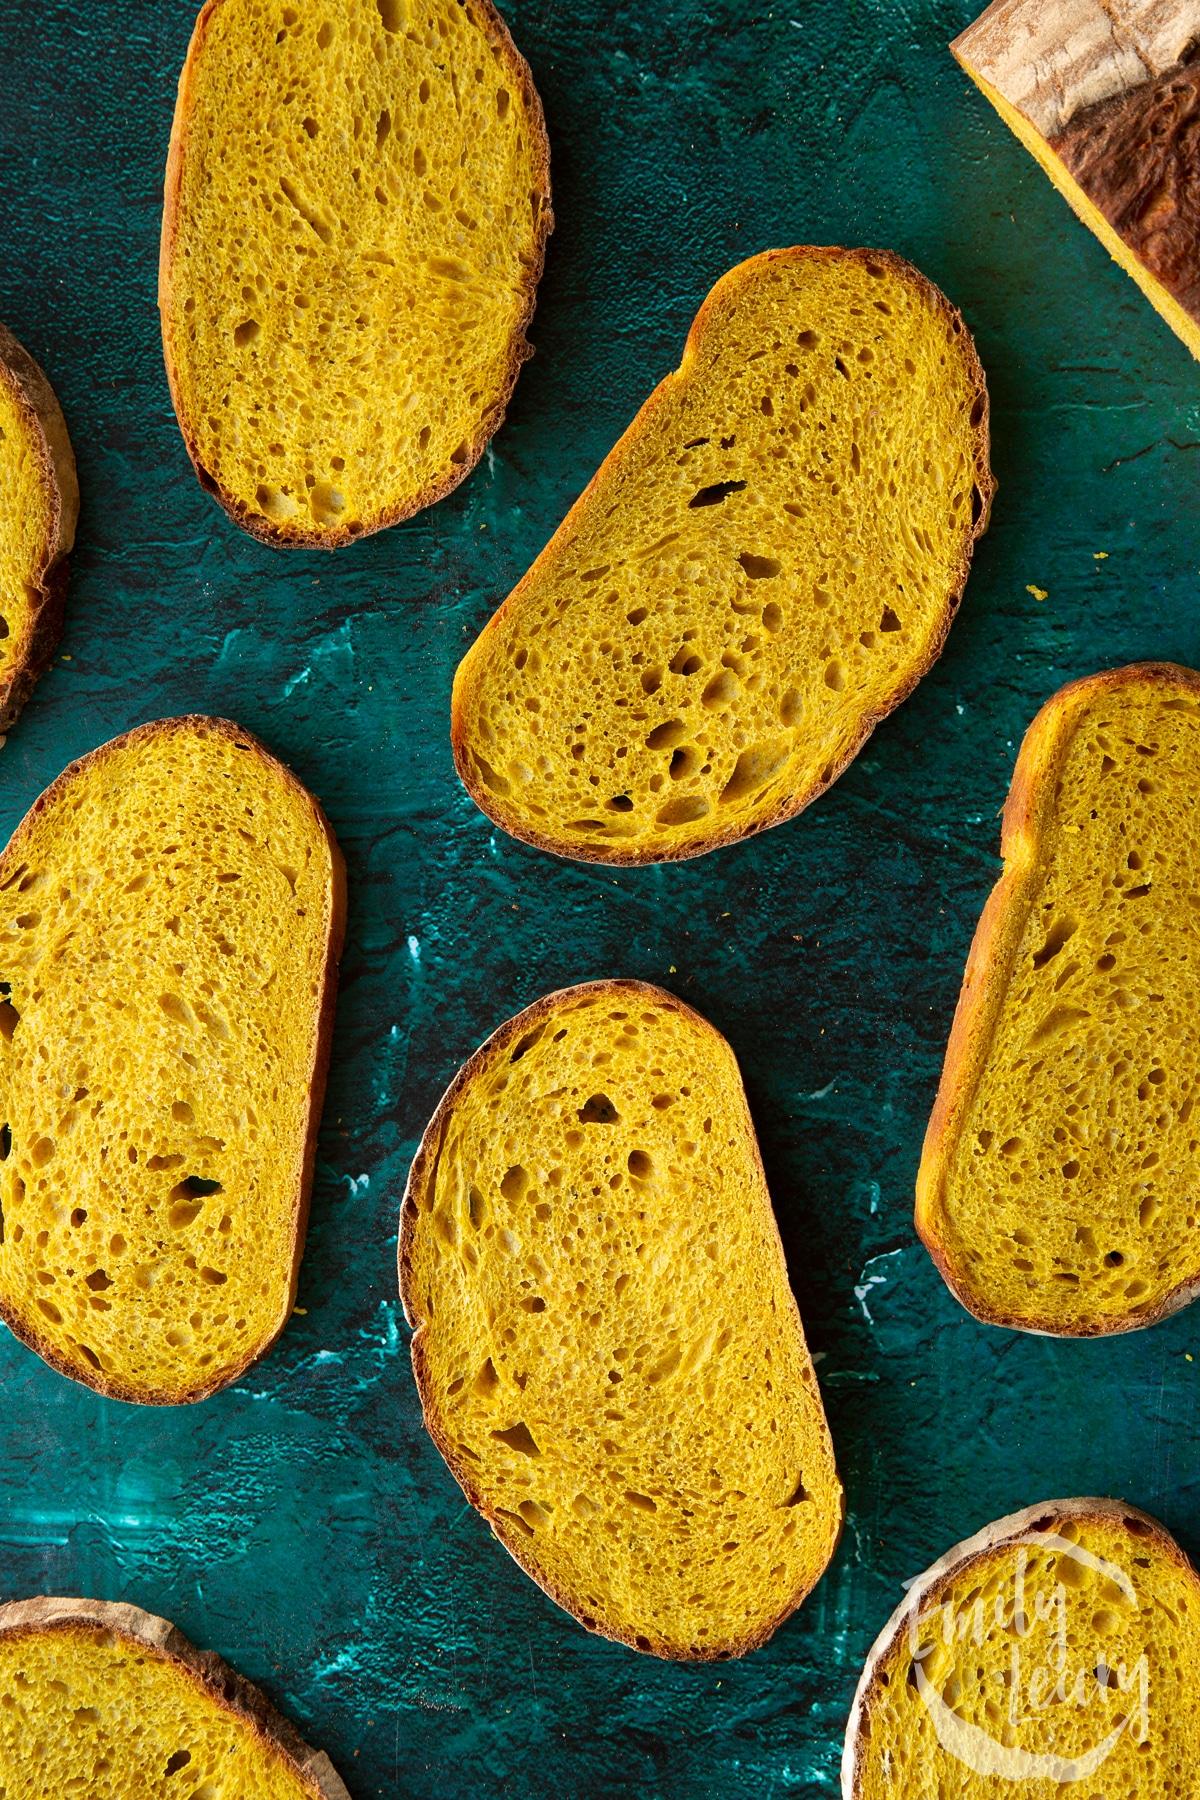 Slices of pumpkin sourdough bread arranged on a dark green surface.